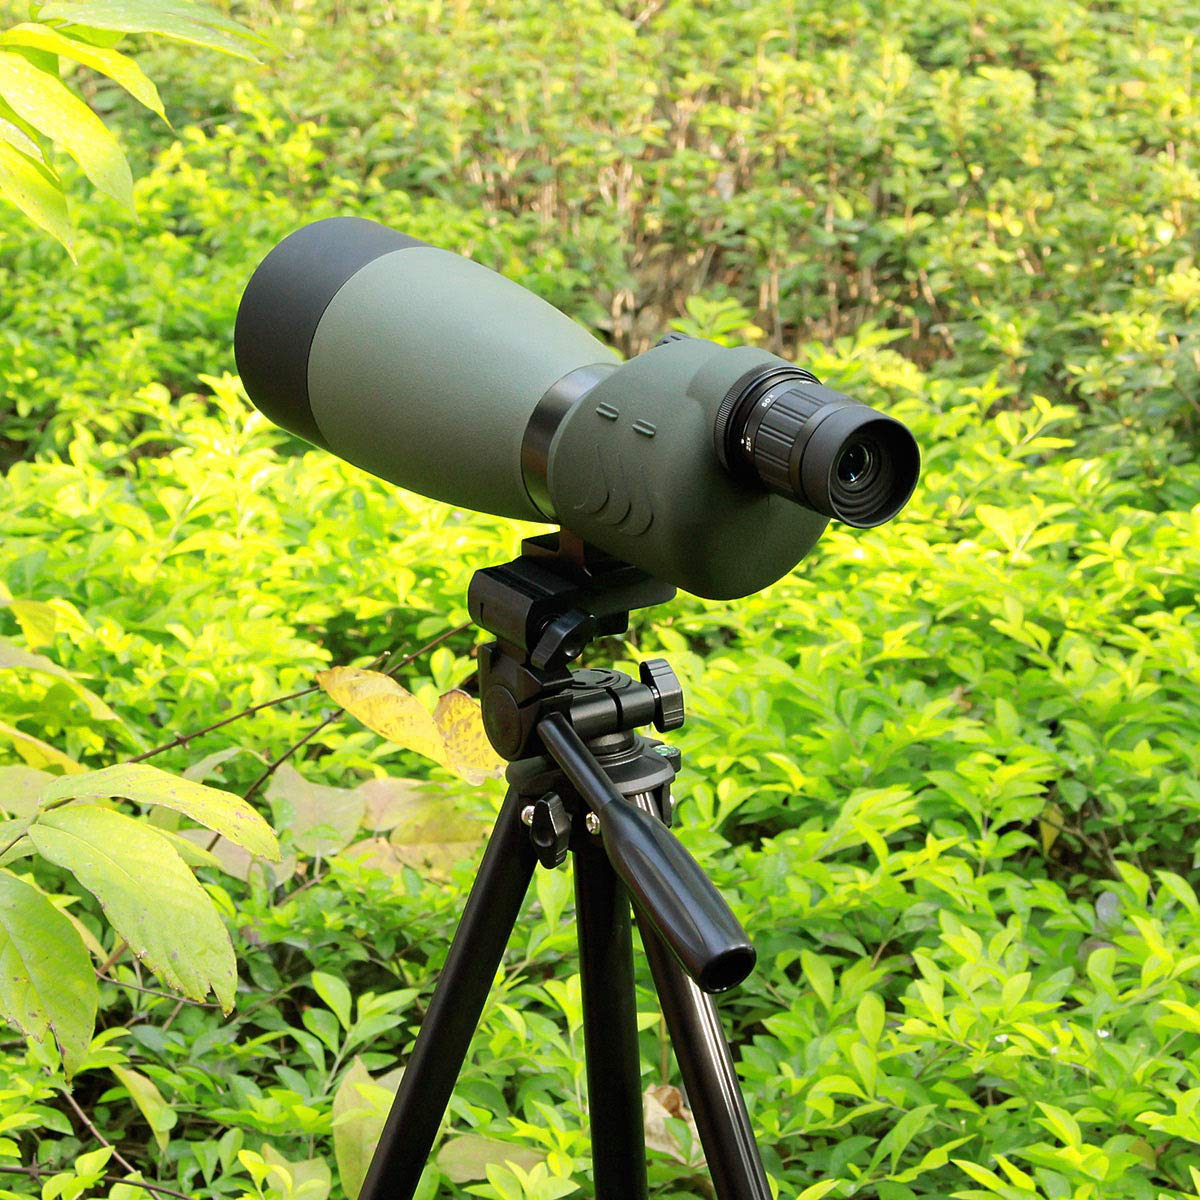 SVBONY SV17 Spotting Scope for Target Shooting Straight scope pic-2